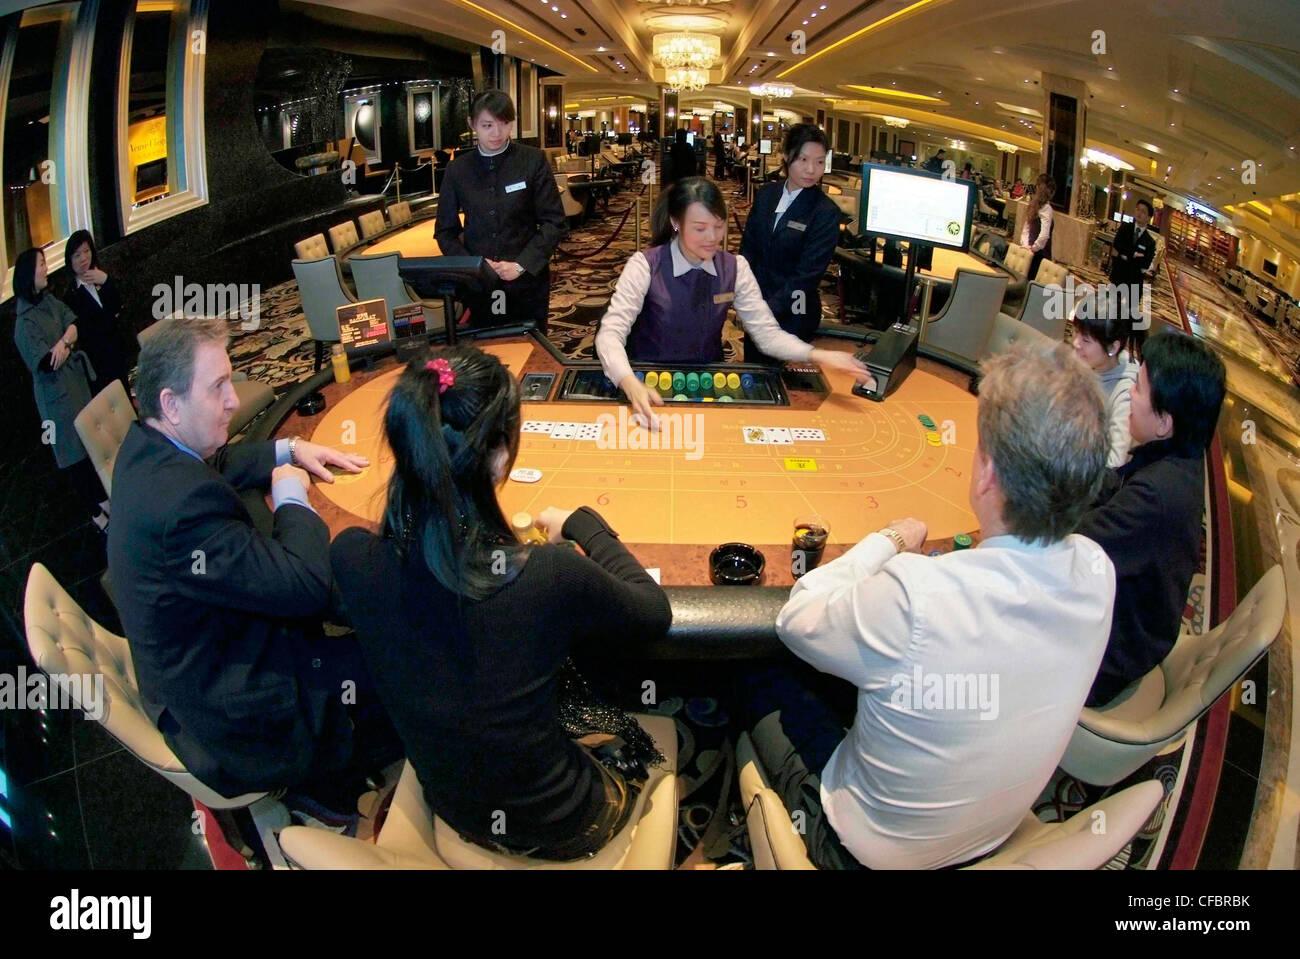 Online sweepstakes casino